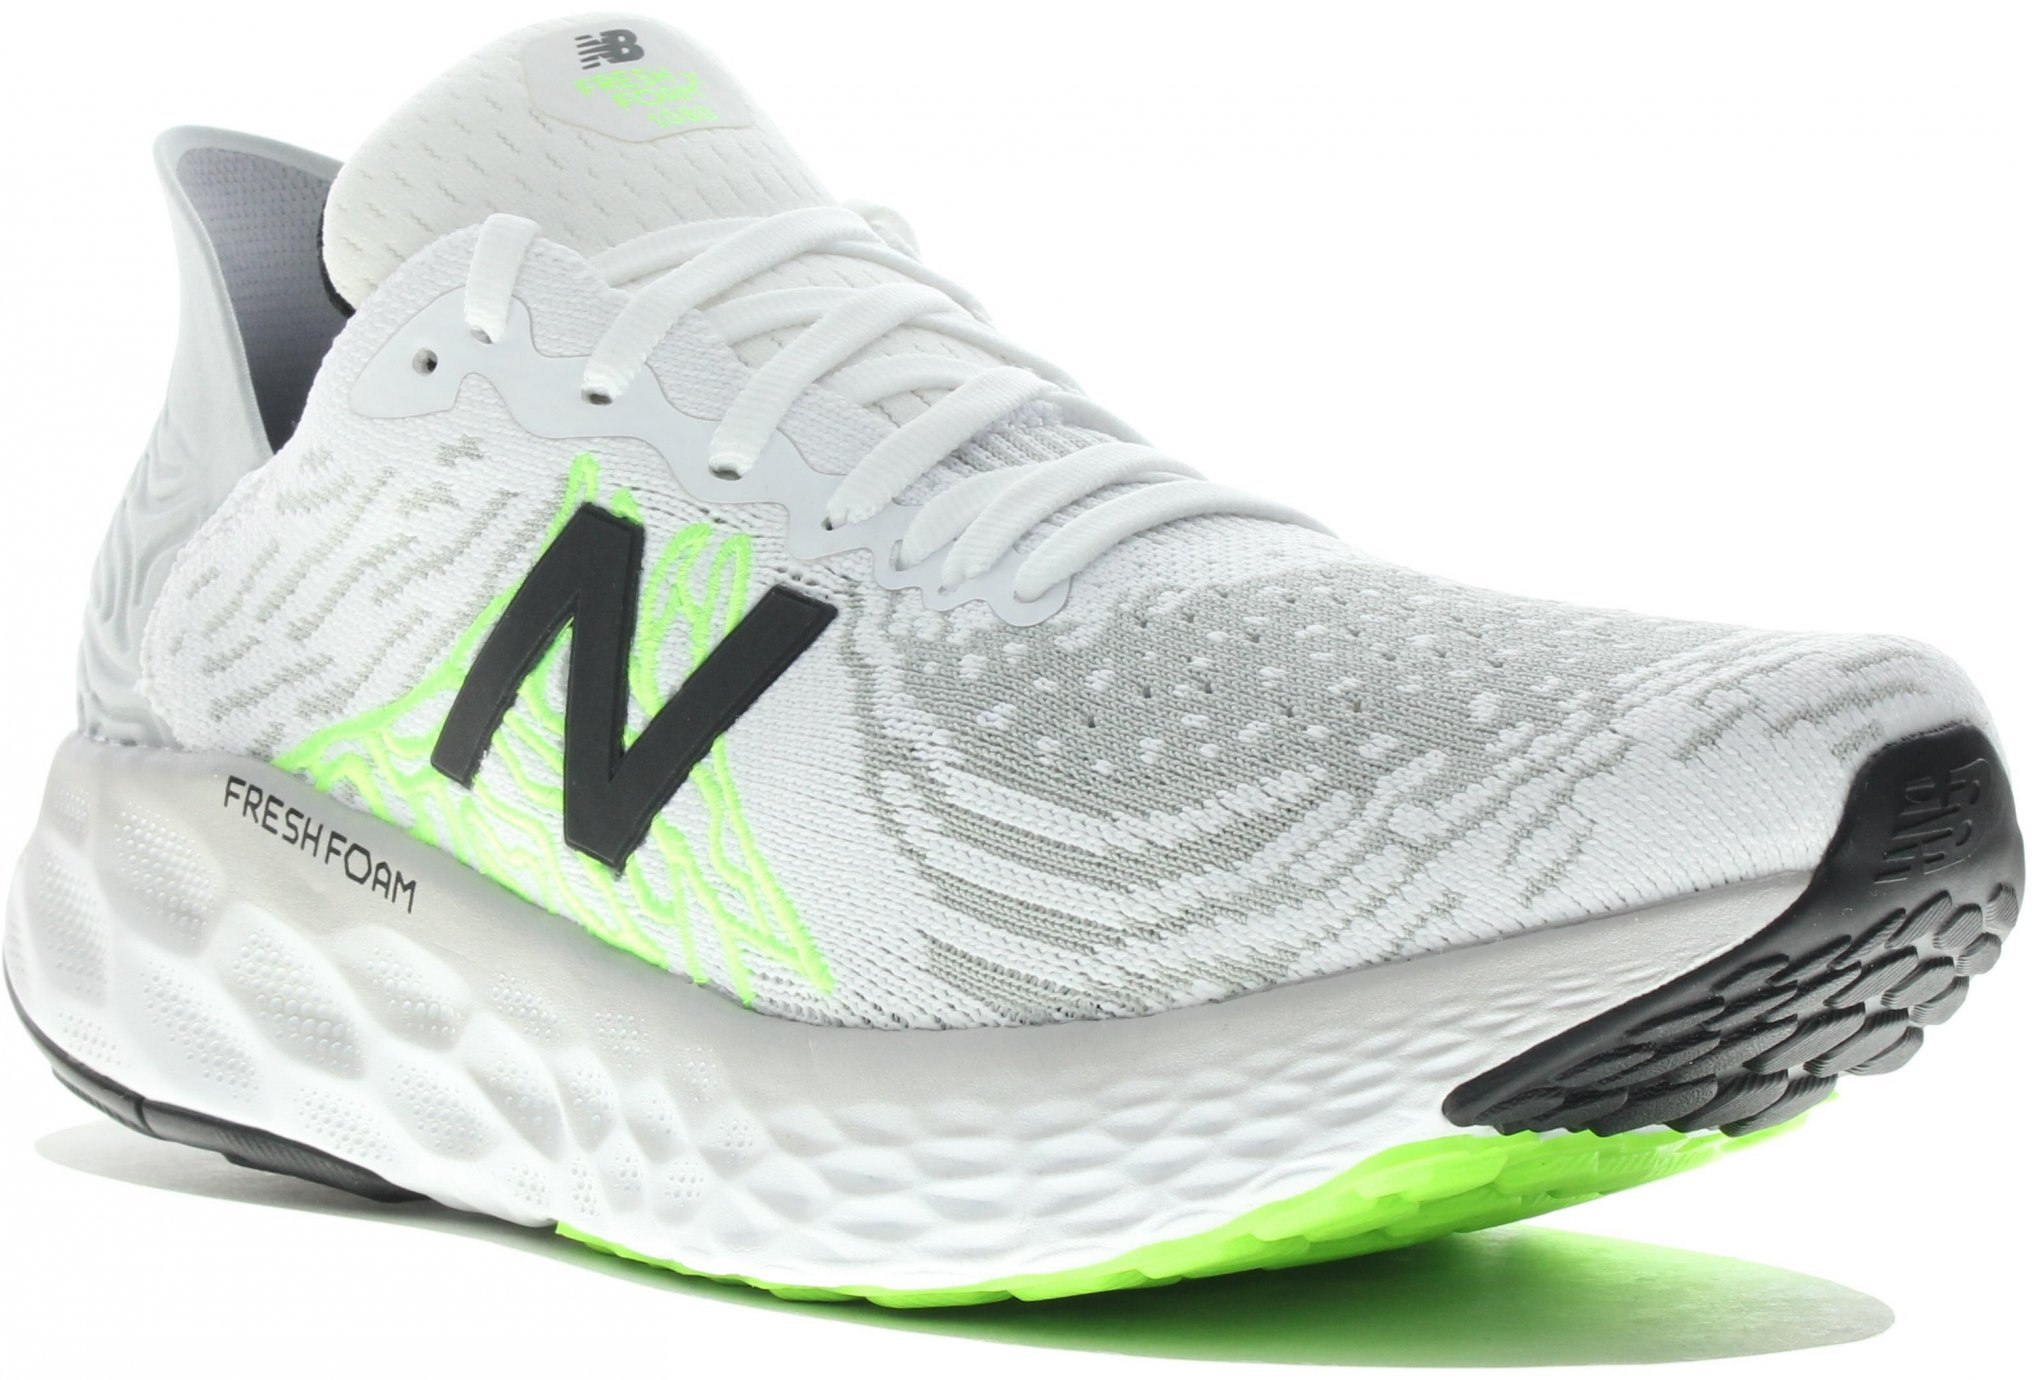 New Balance Fresh Foam M 1080 V10 - D Chaussures homme